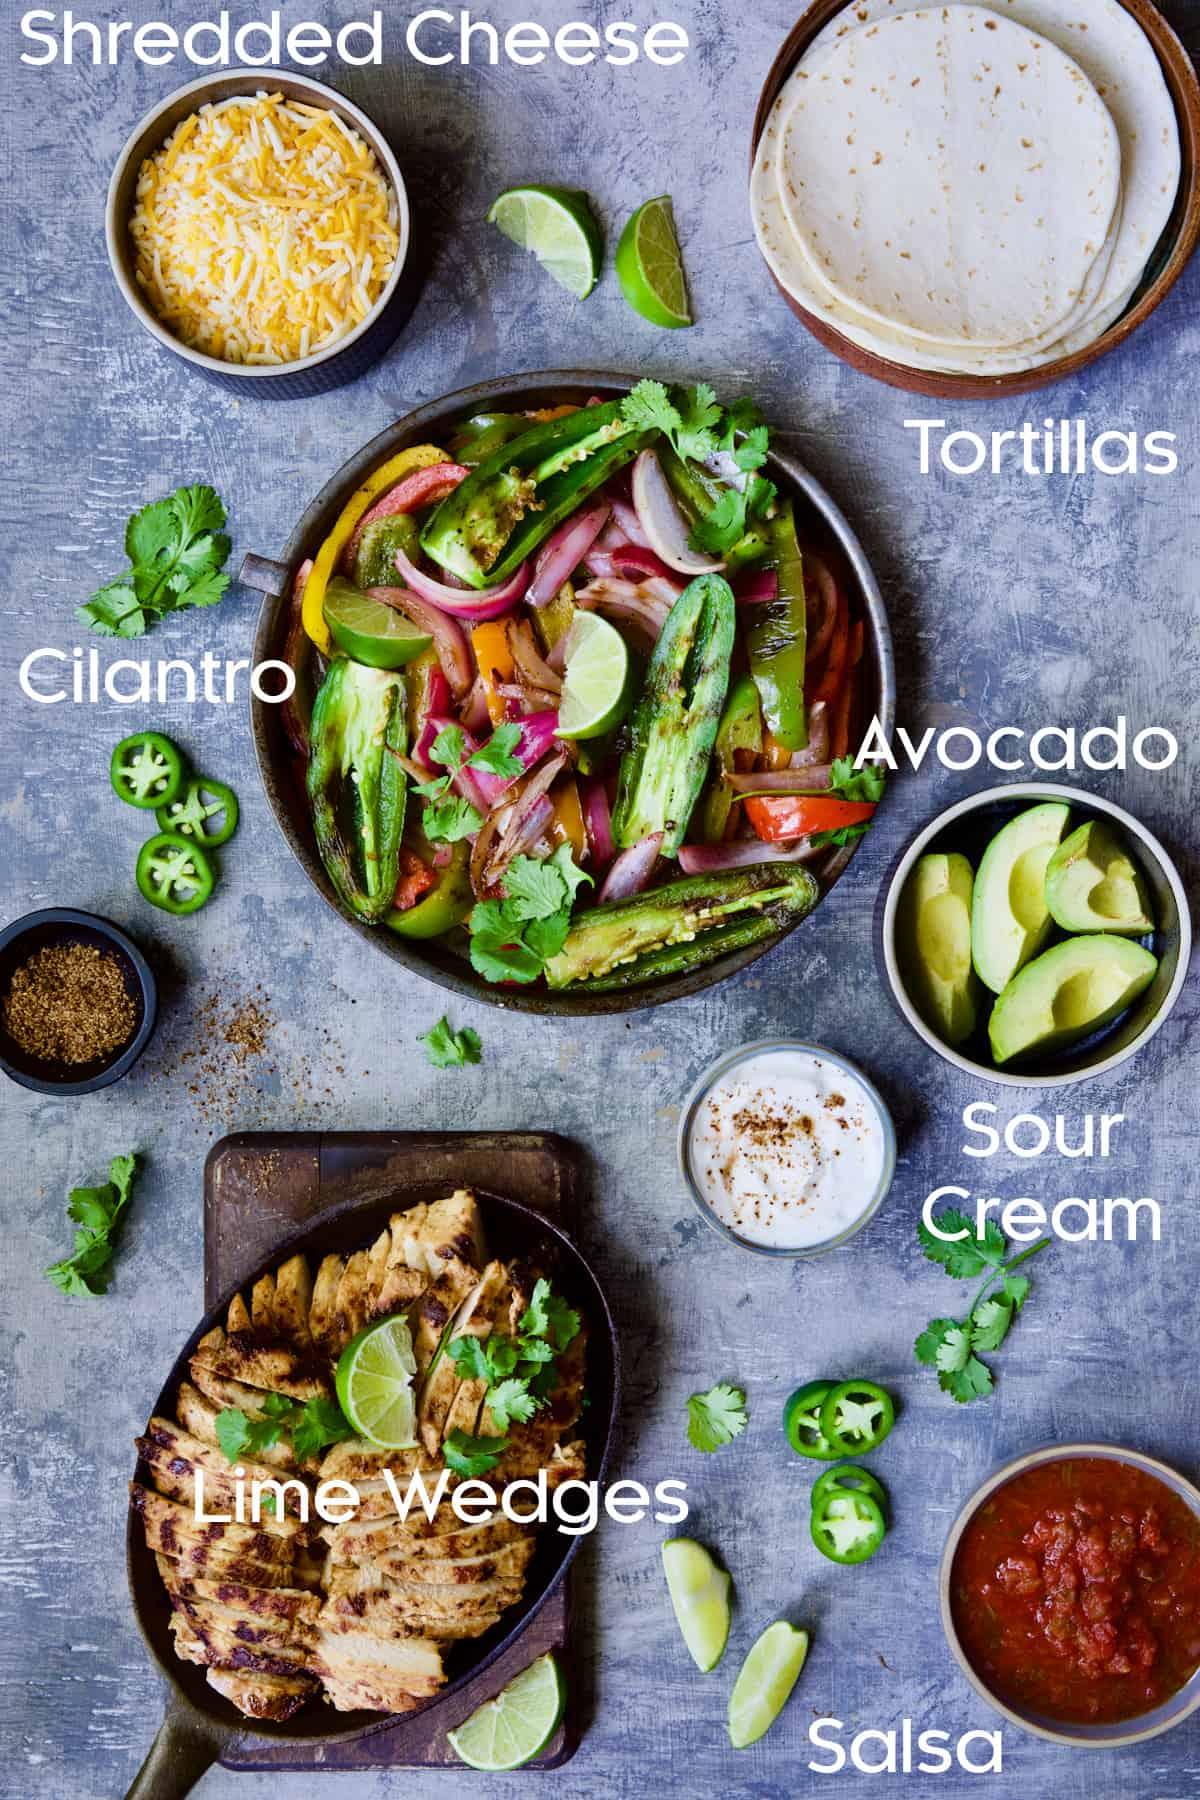 Ingredients for Grilled Tagin-Seasoned Chicken Fajitas on blue background.